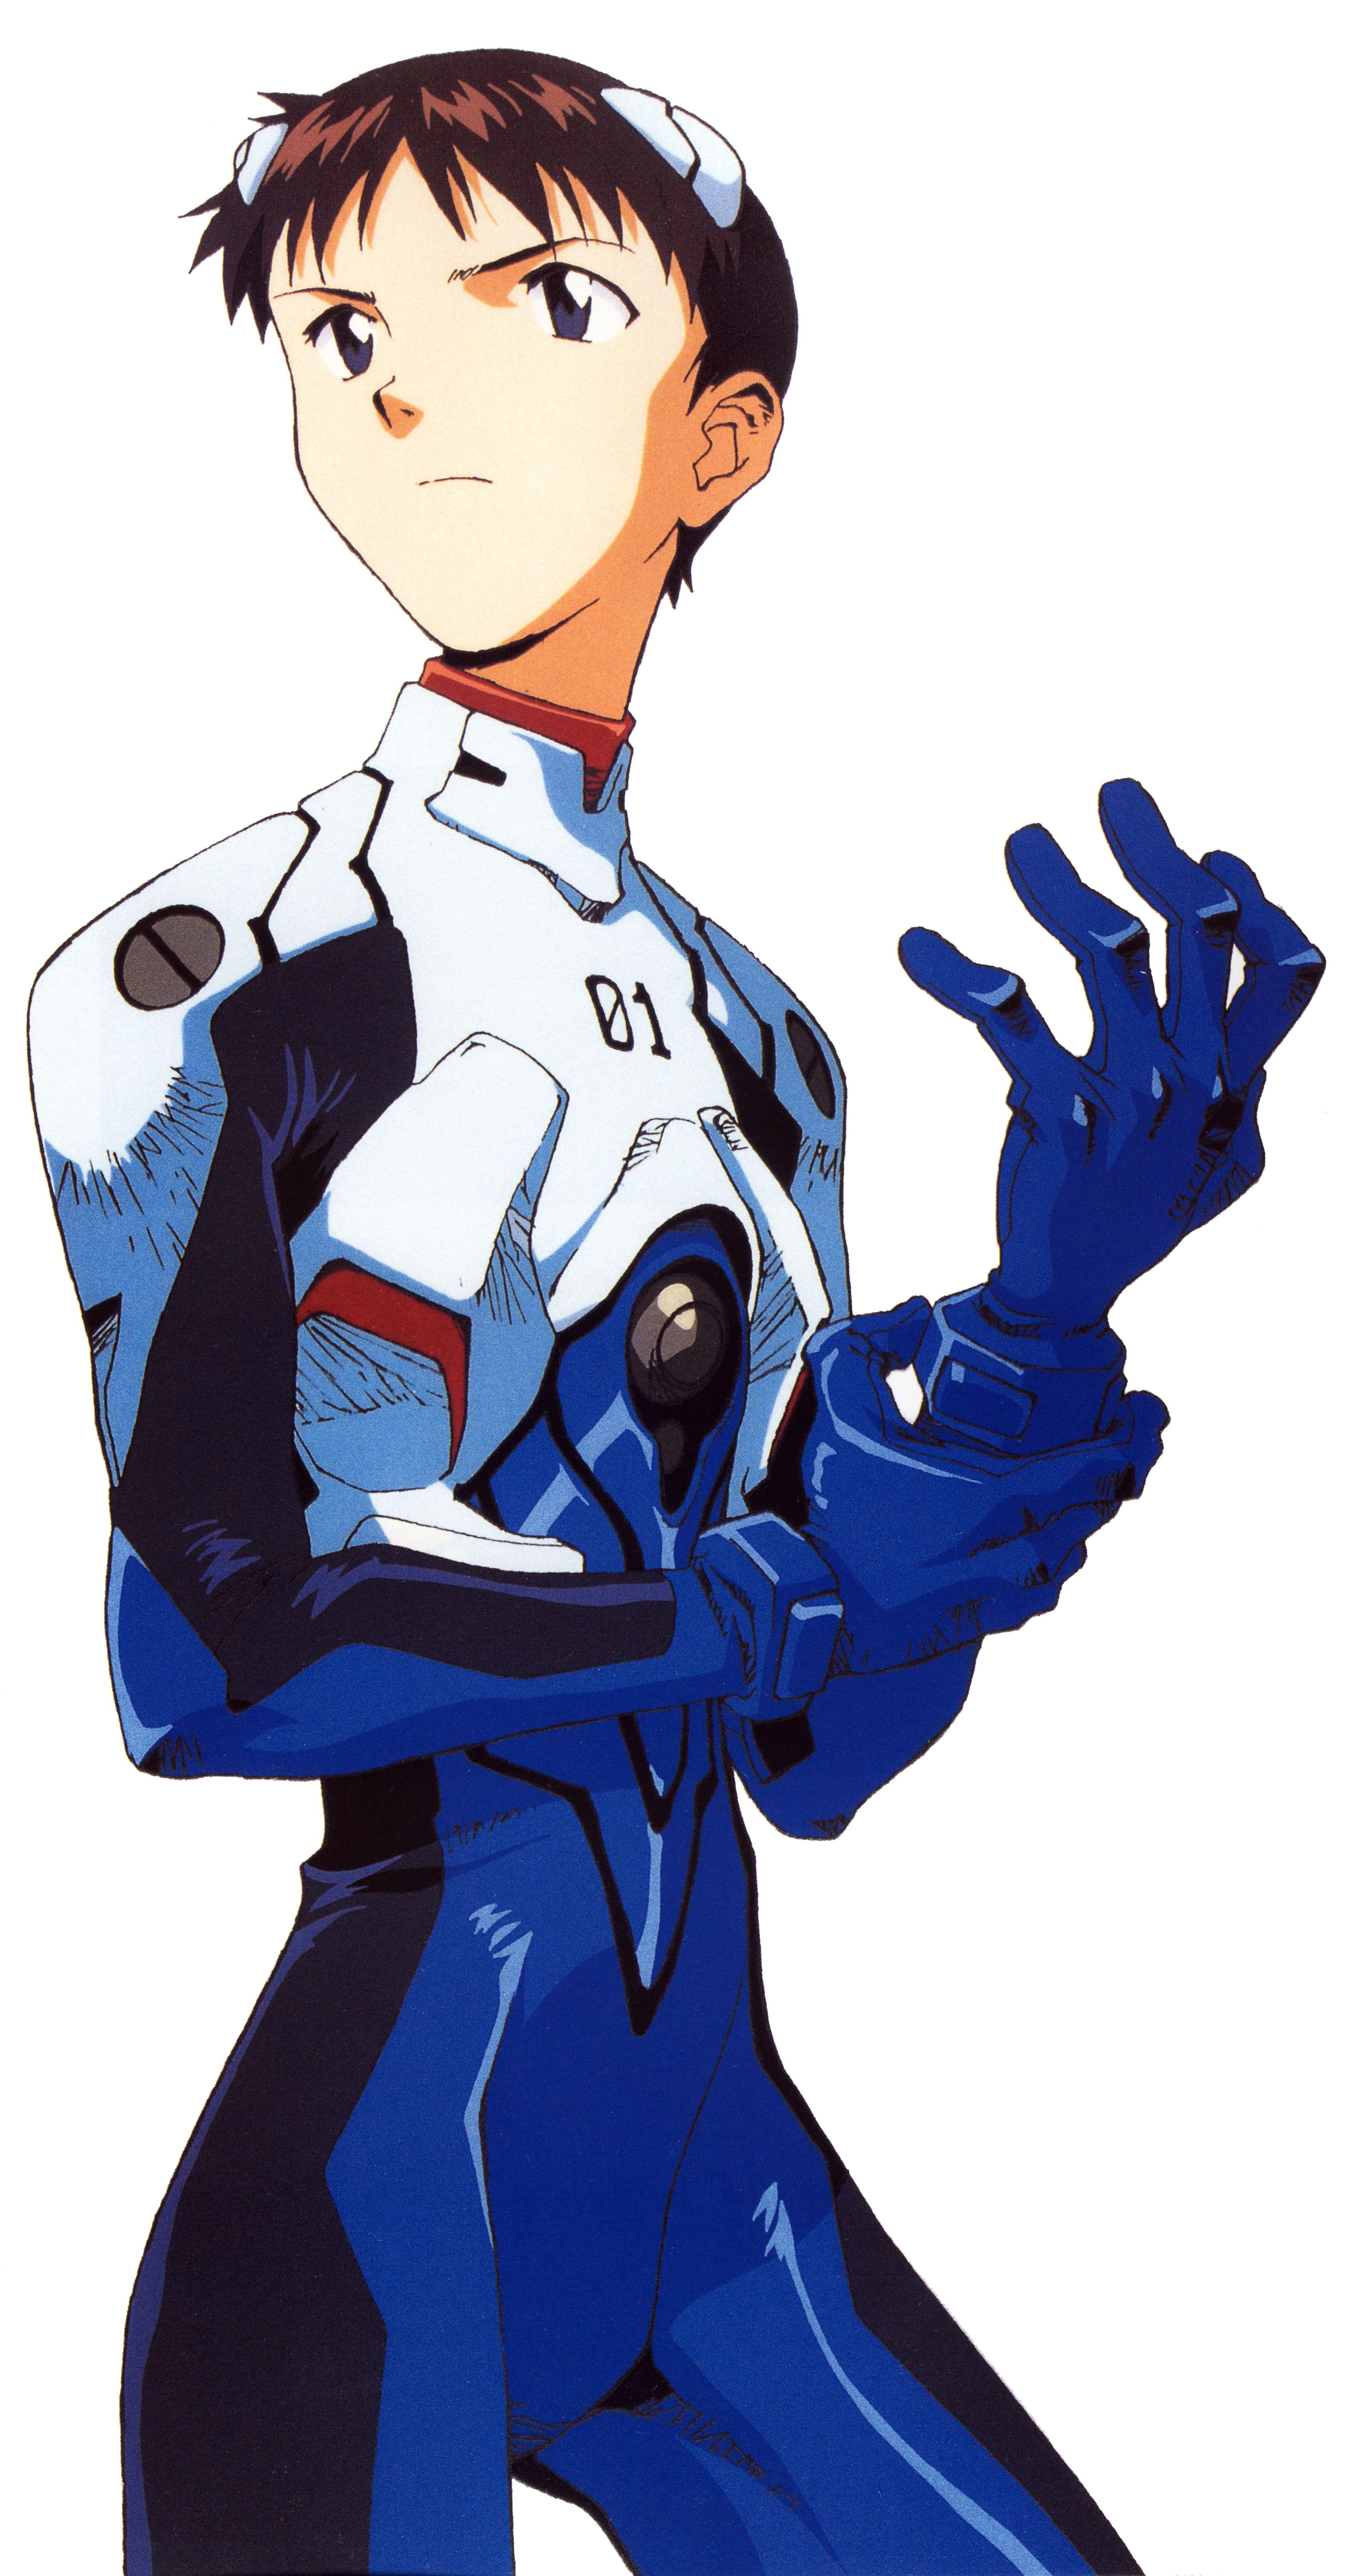 Ikari Shinji - Neon Genesis Evangelion - Image #436835 - Zerochan Anime Image Board